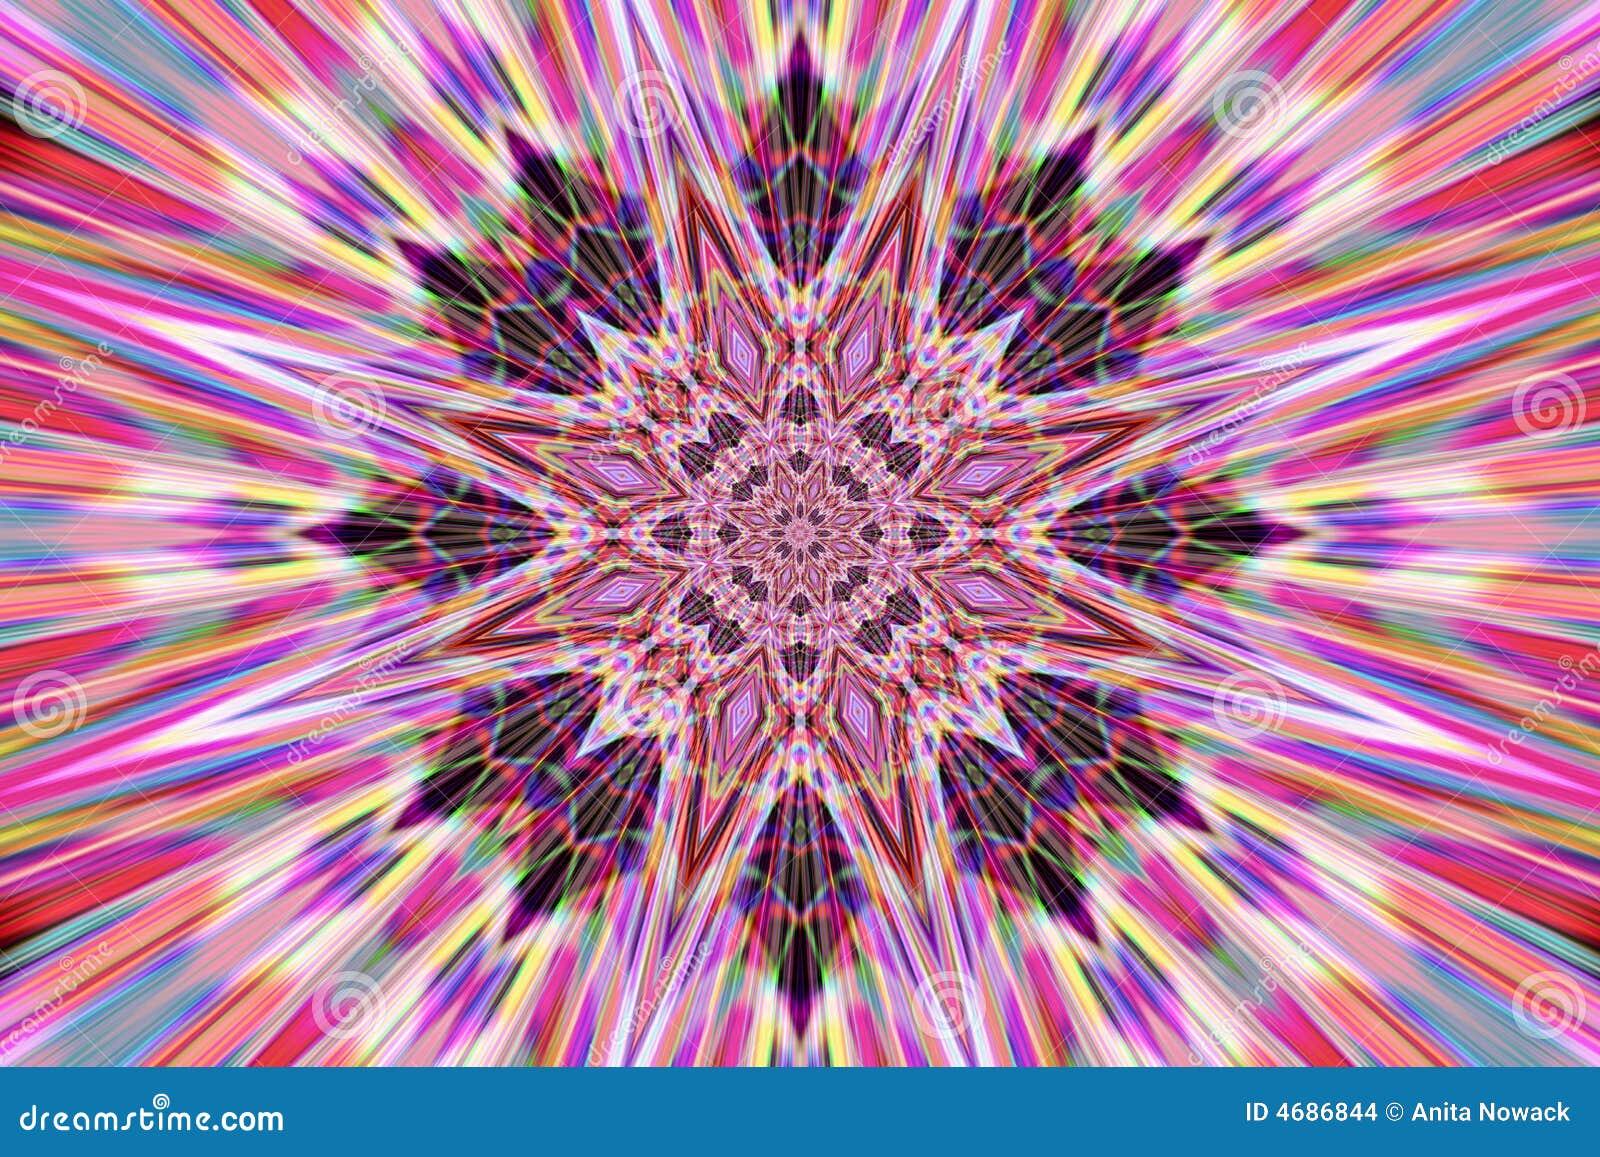 Mandala abstrakcyjne